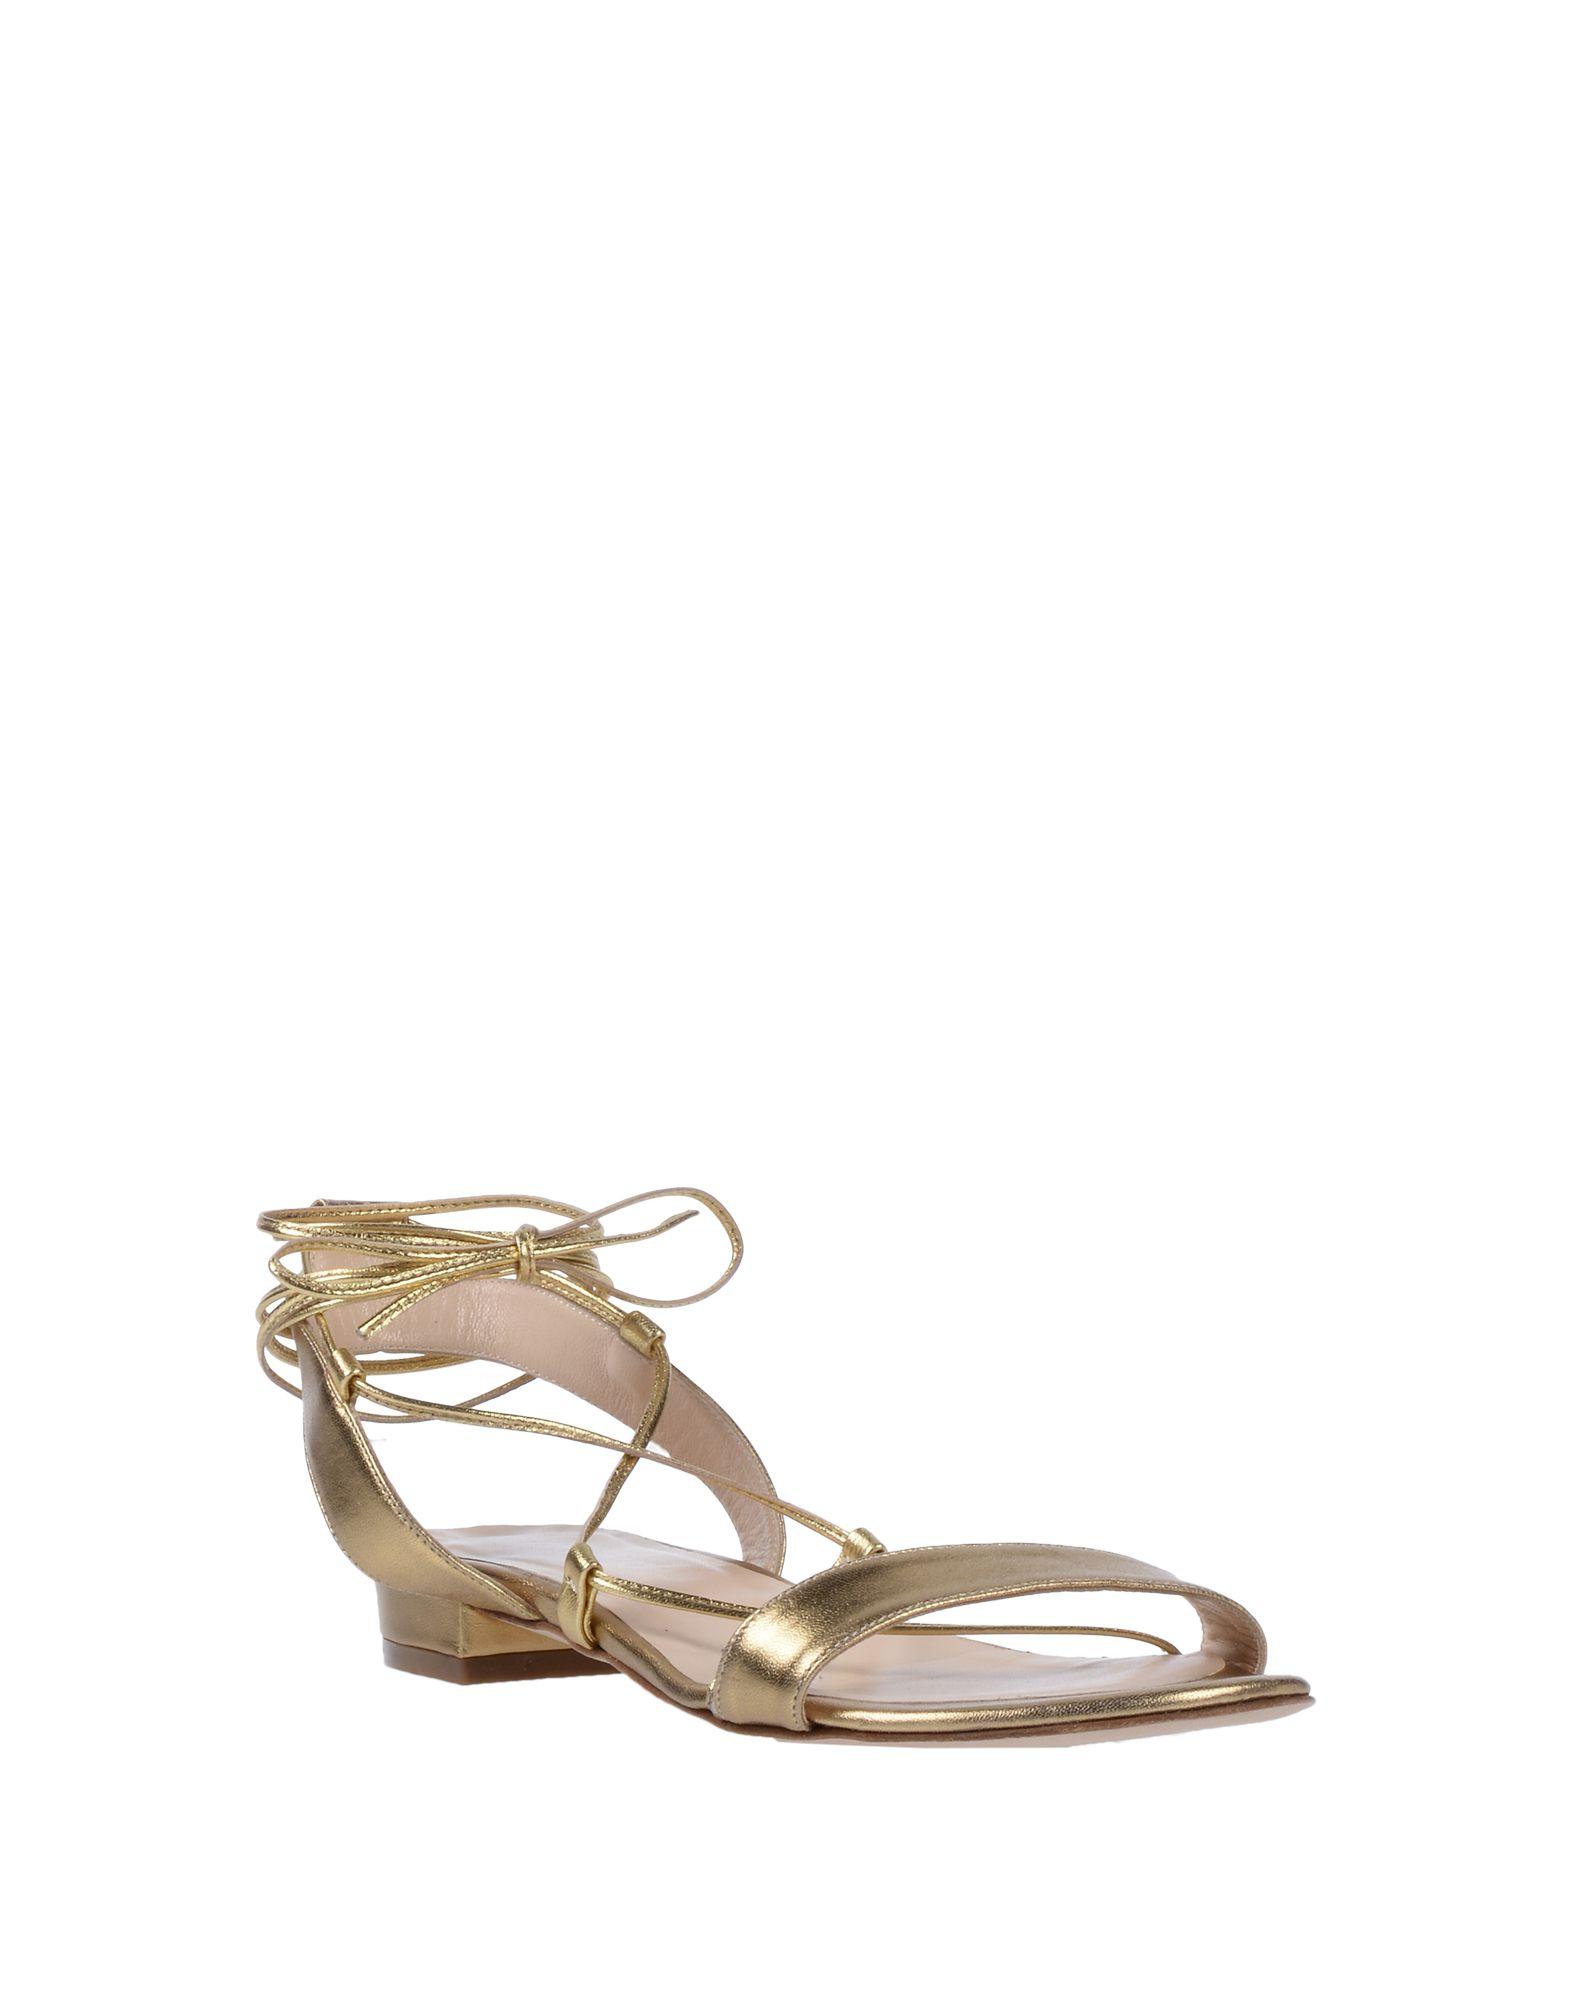 blugirl blumarine sandales - femmes blugirl blumarine sandales en en en ligne sur l'australie - 11571831mn f231f5